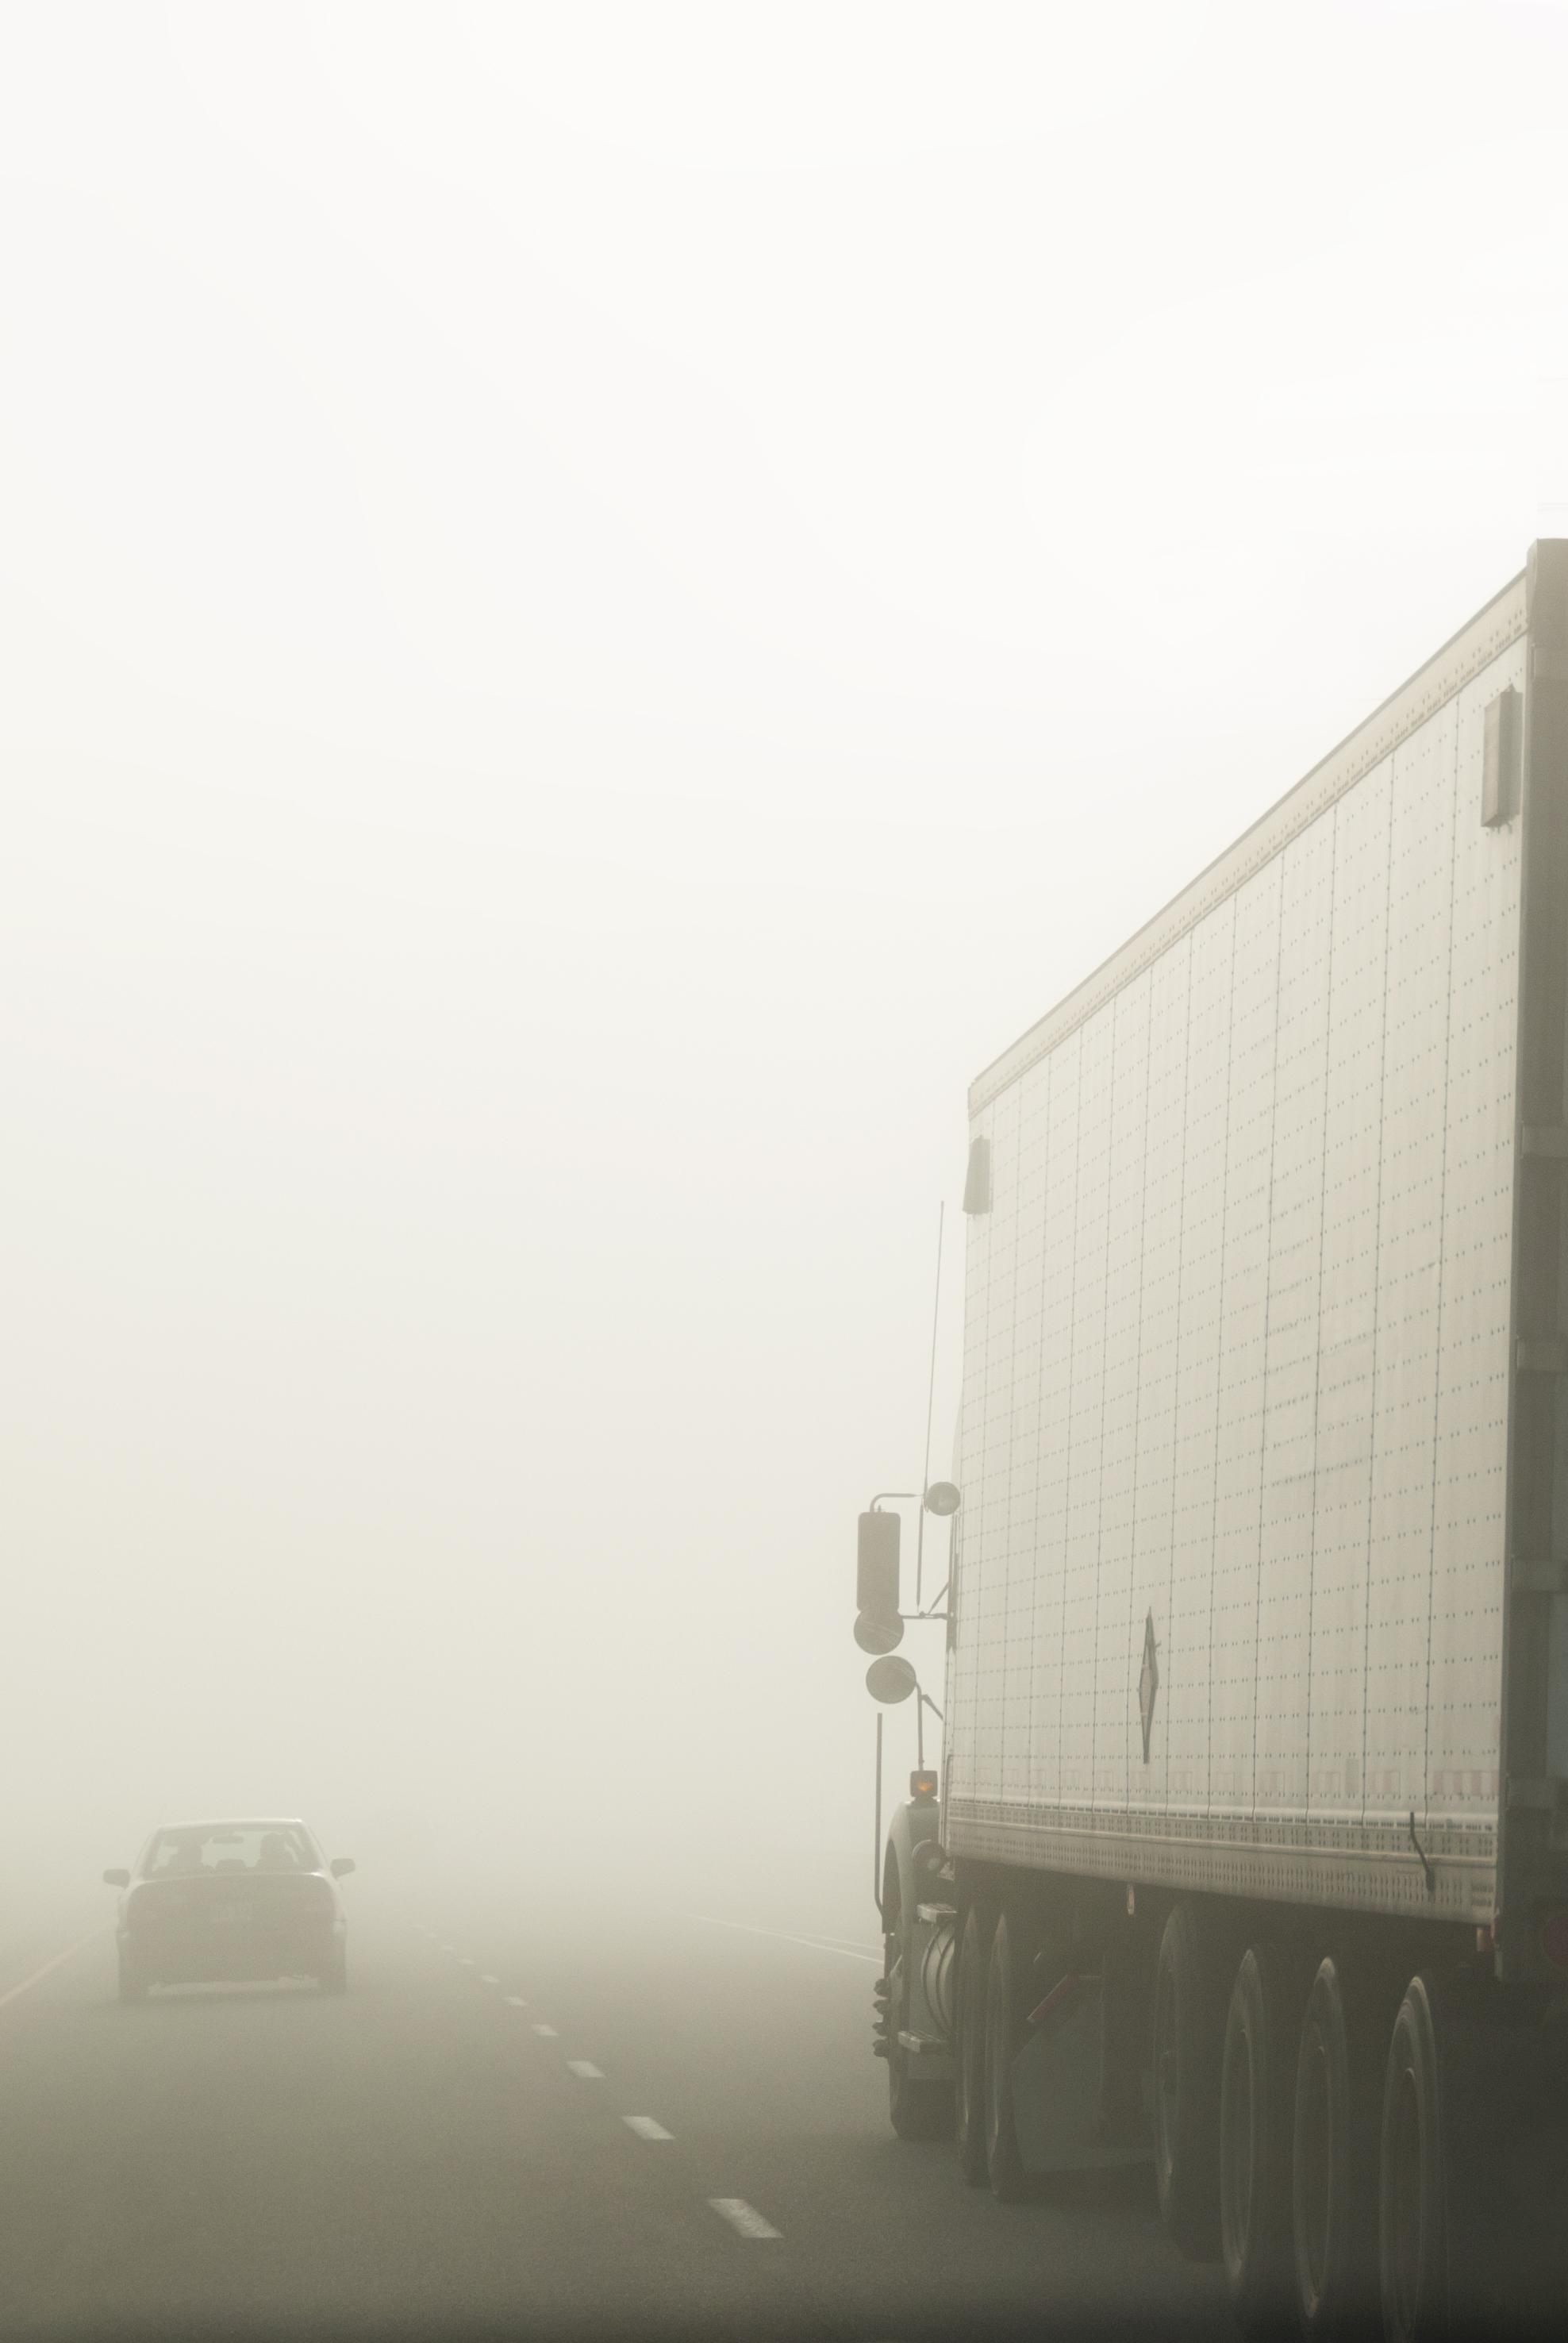 Mist_Dry_Van